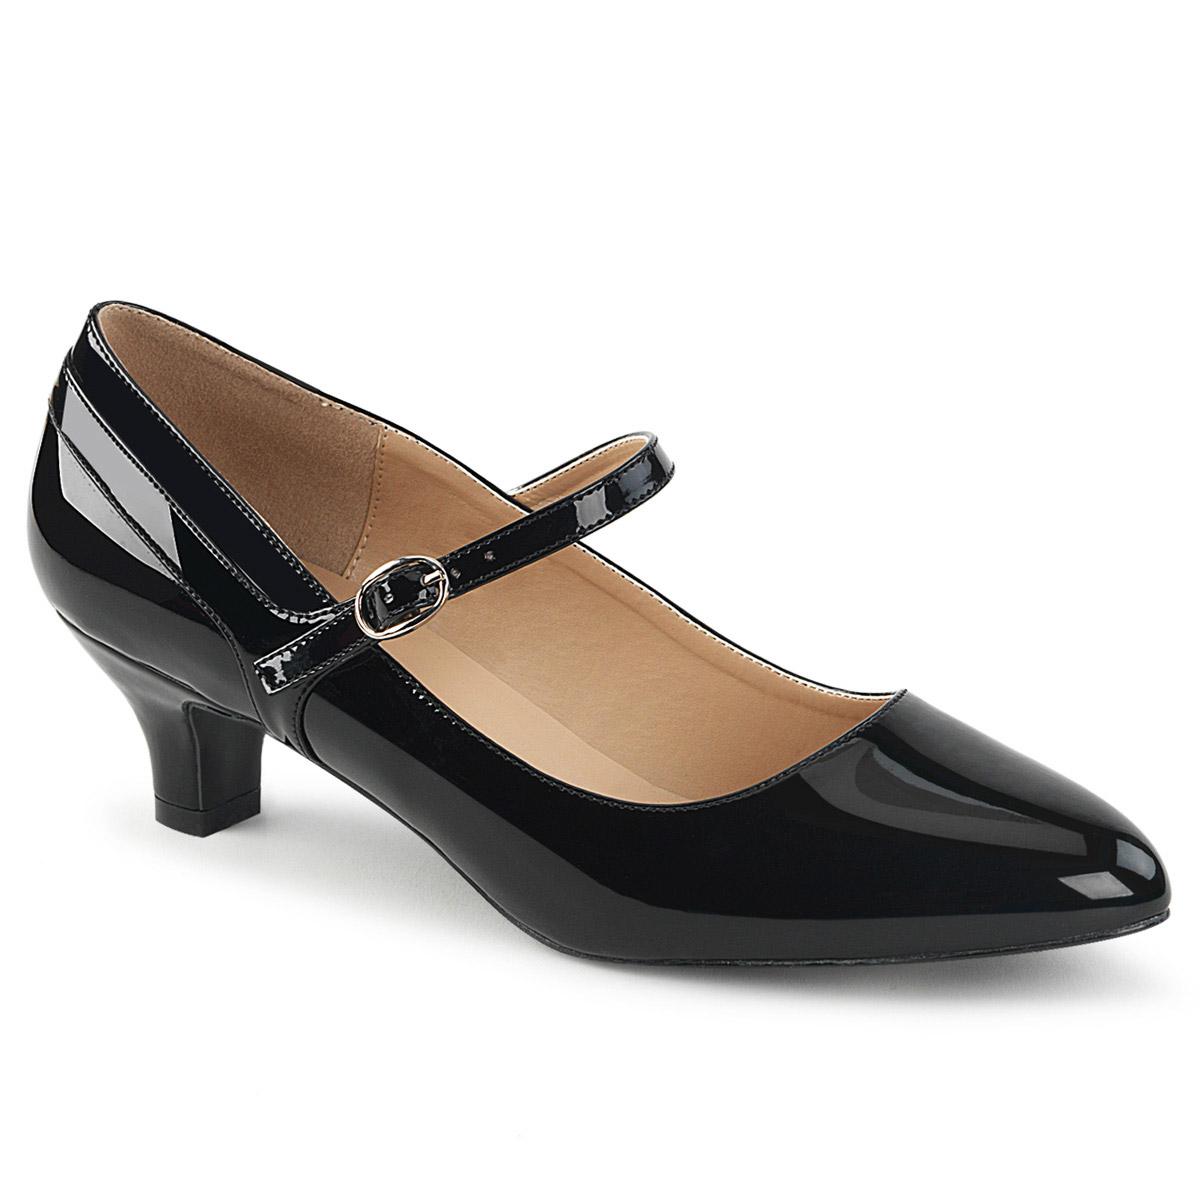 Pleaser-2-034-Kitten-Heel-Mary-Jane-Pump-Adult-Women-High-Heels-Blk-Pat-Shoes